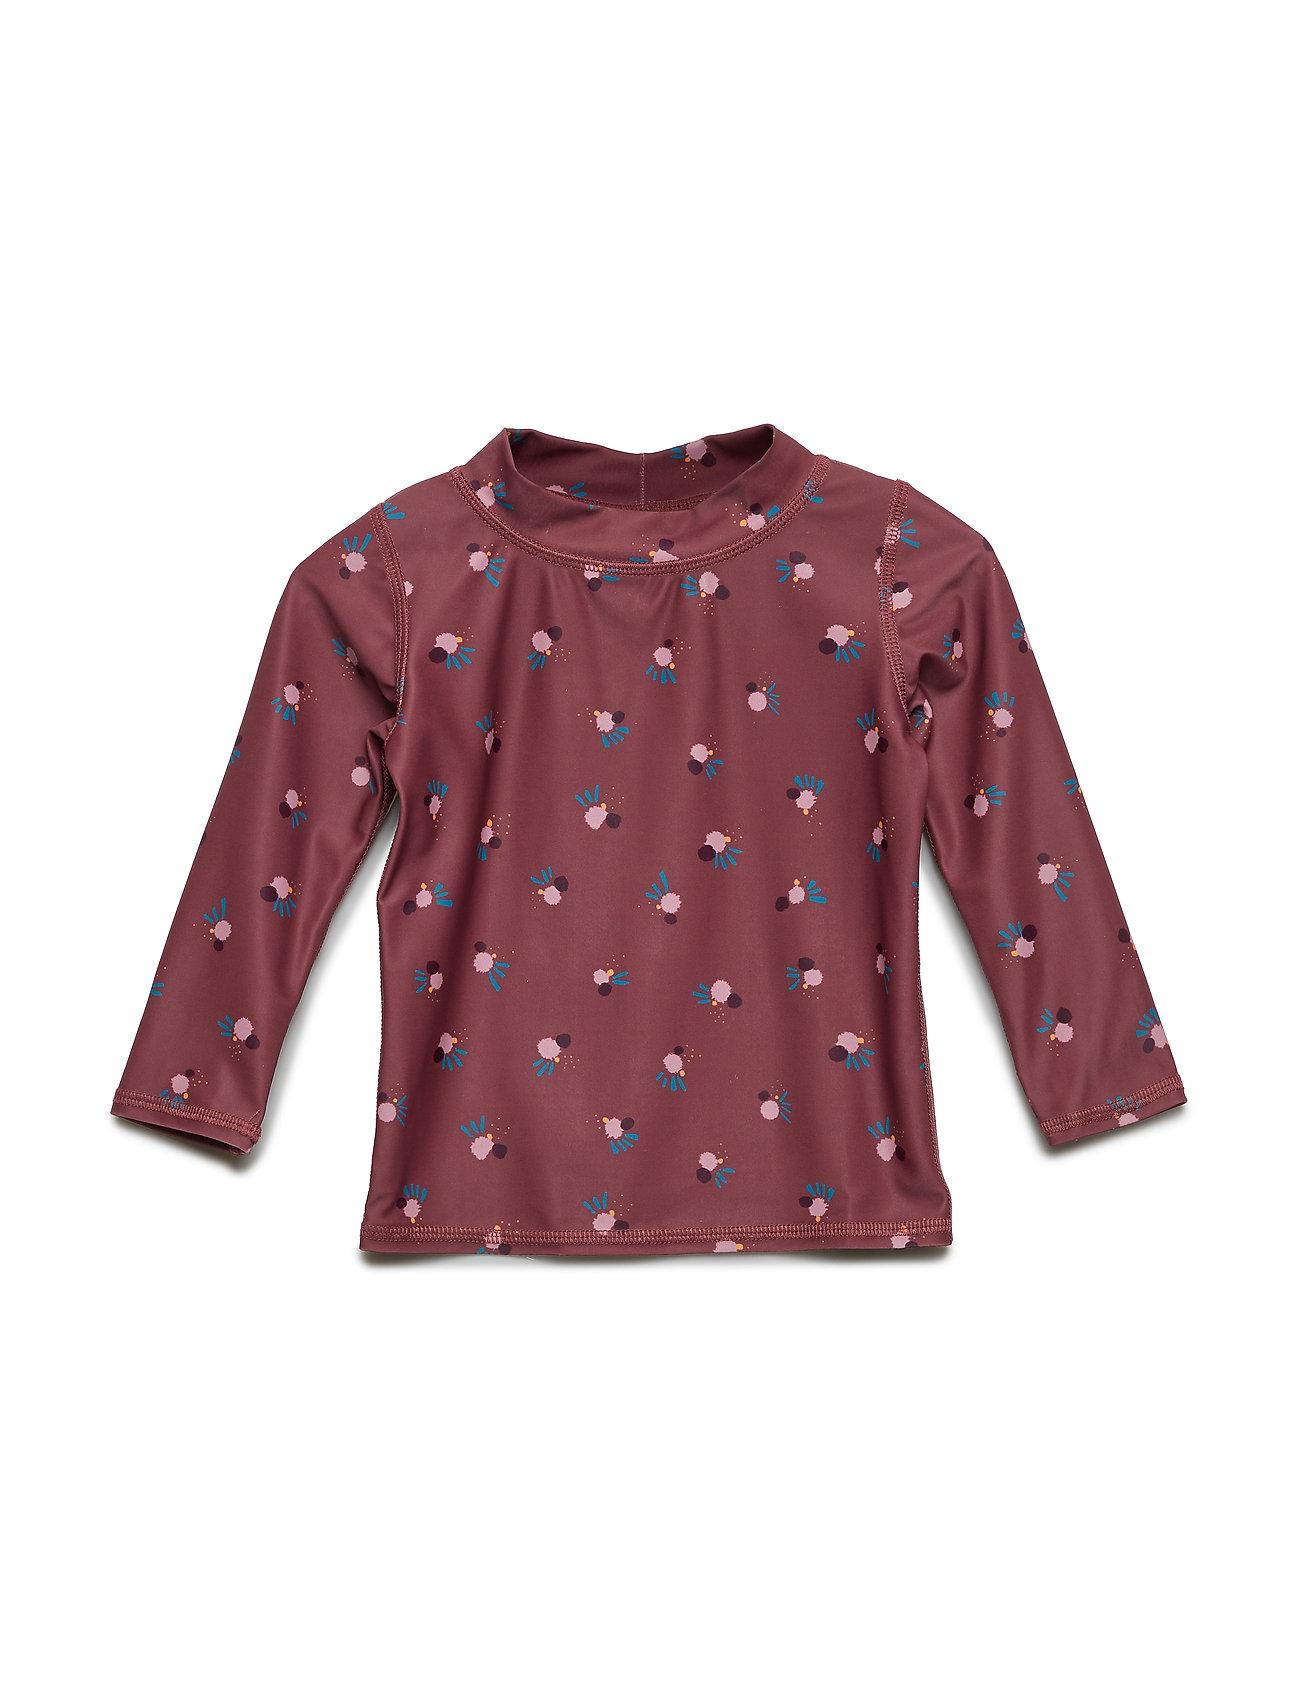 Soft Gallery Baby Astin Sun Shirt - RENAISSANCE ROSE, AOP COCKATOO SWIM